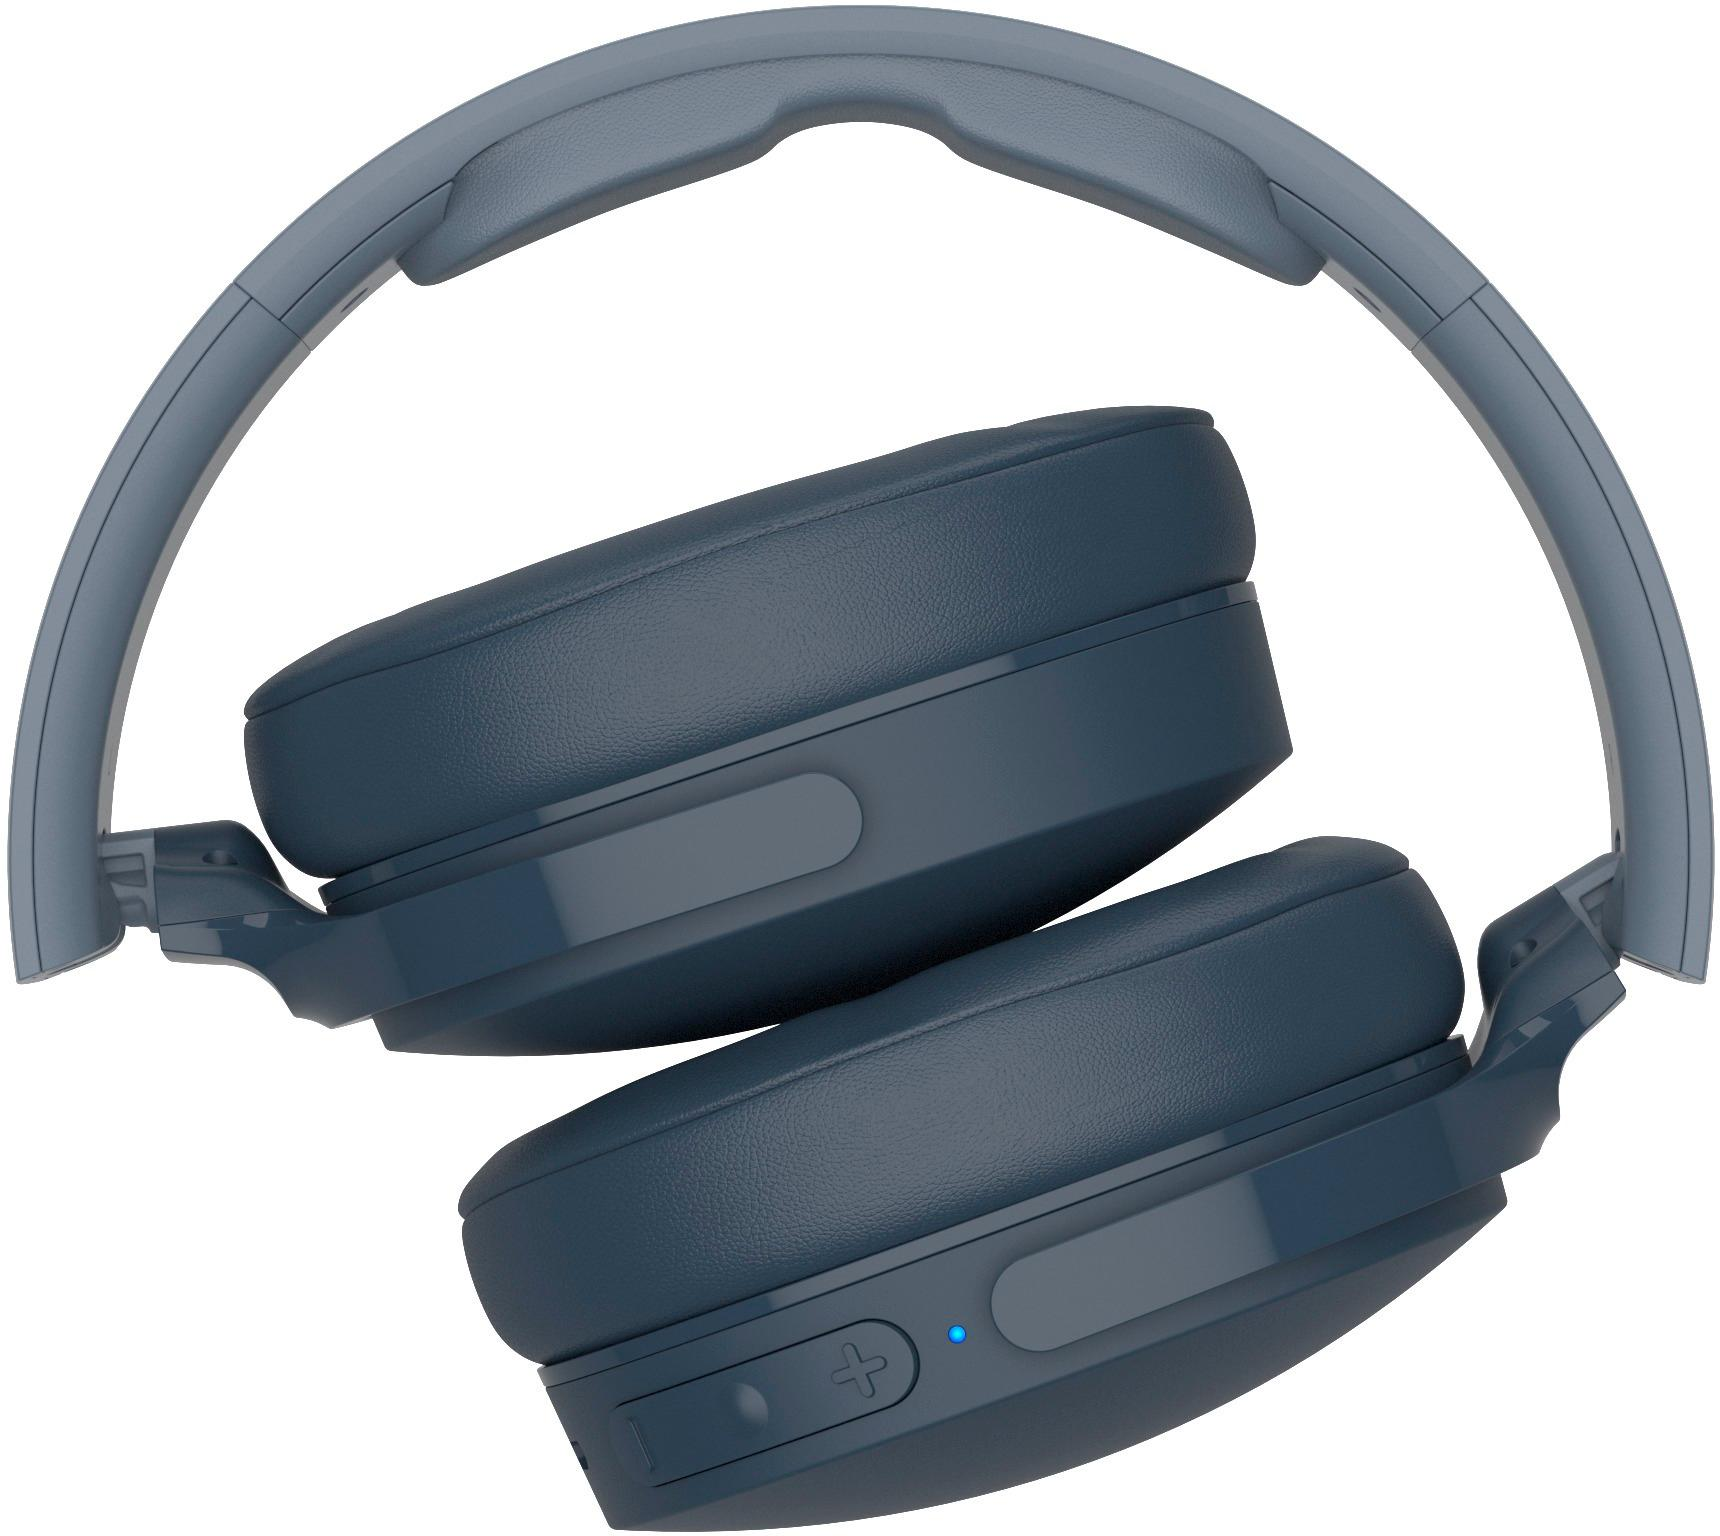 hight resolution of skullcandy hesh 3 wireless over the ear headphones blue s6htw k617 best buy